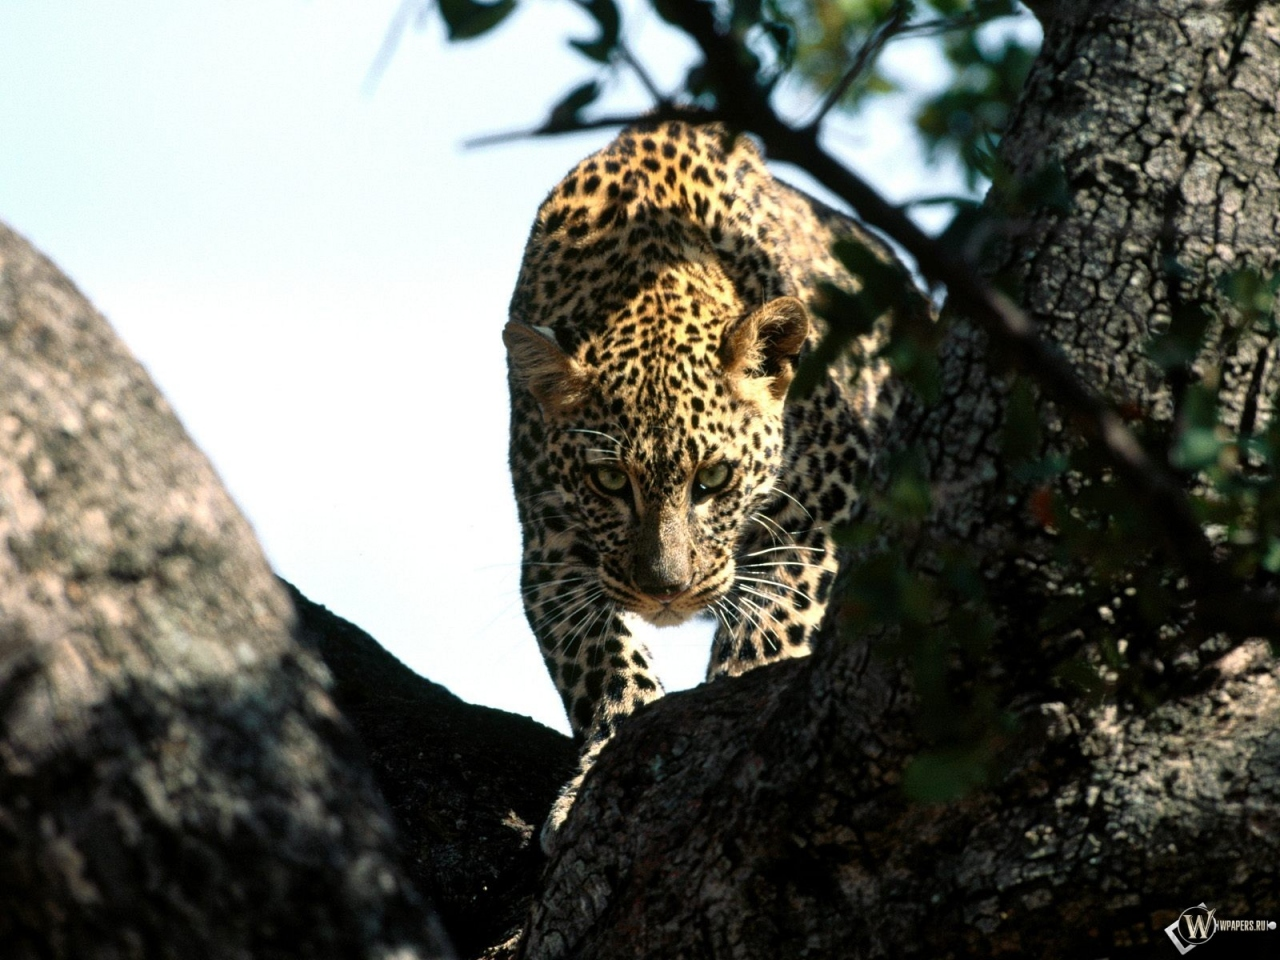 Леопард крадется по дереву 1280x960